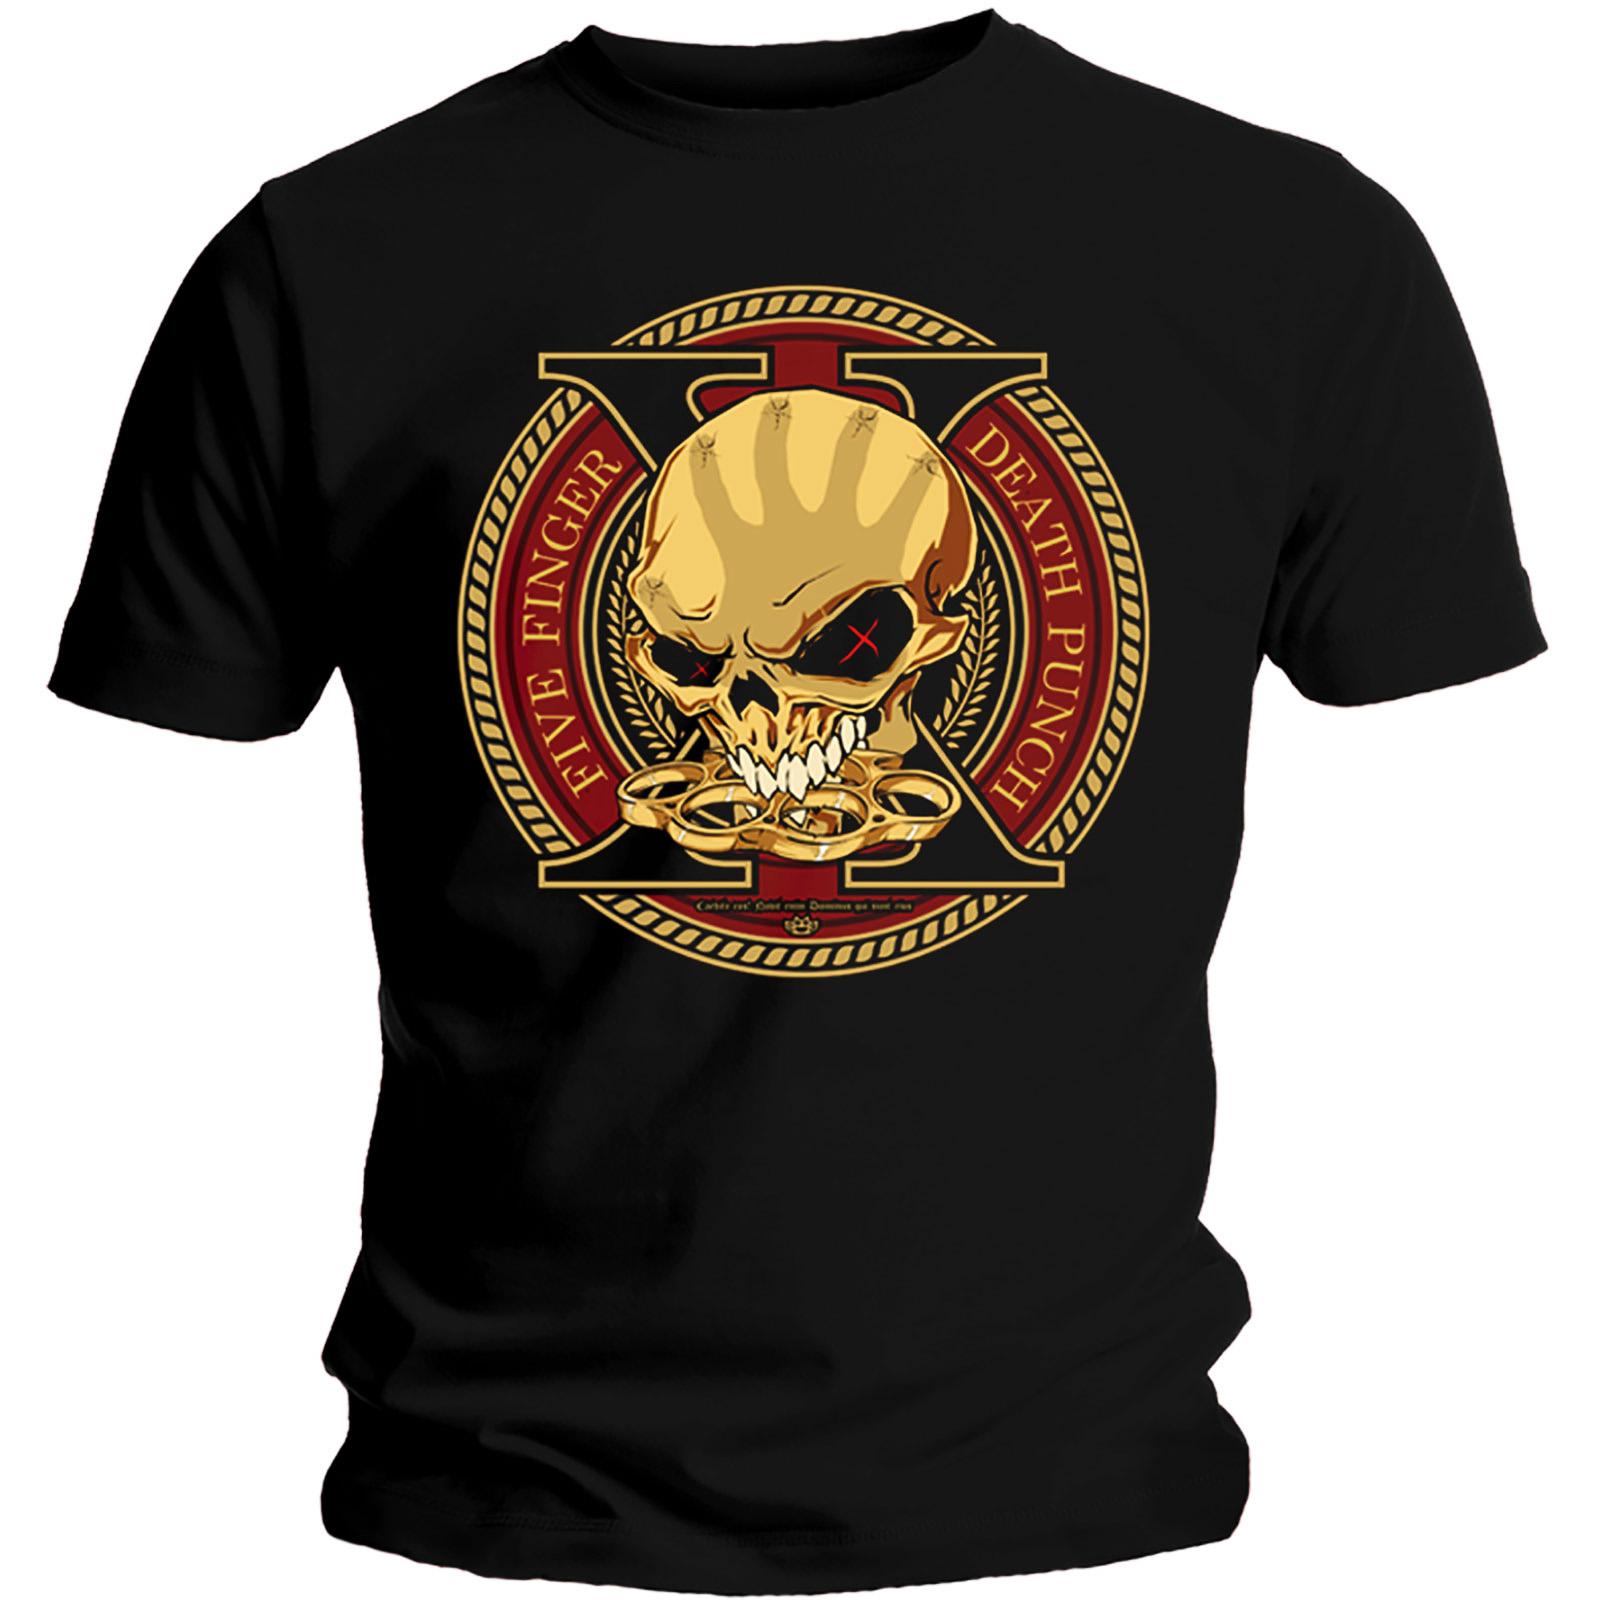 Official-T-Shirt-Five-Finger-Death-Punch-Album-DECADE-of-Destruction-All-Sizes thumbnail 11